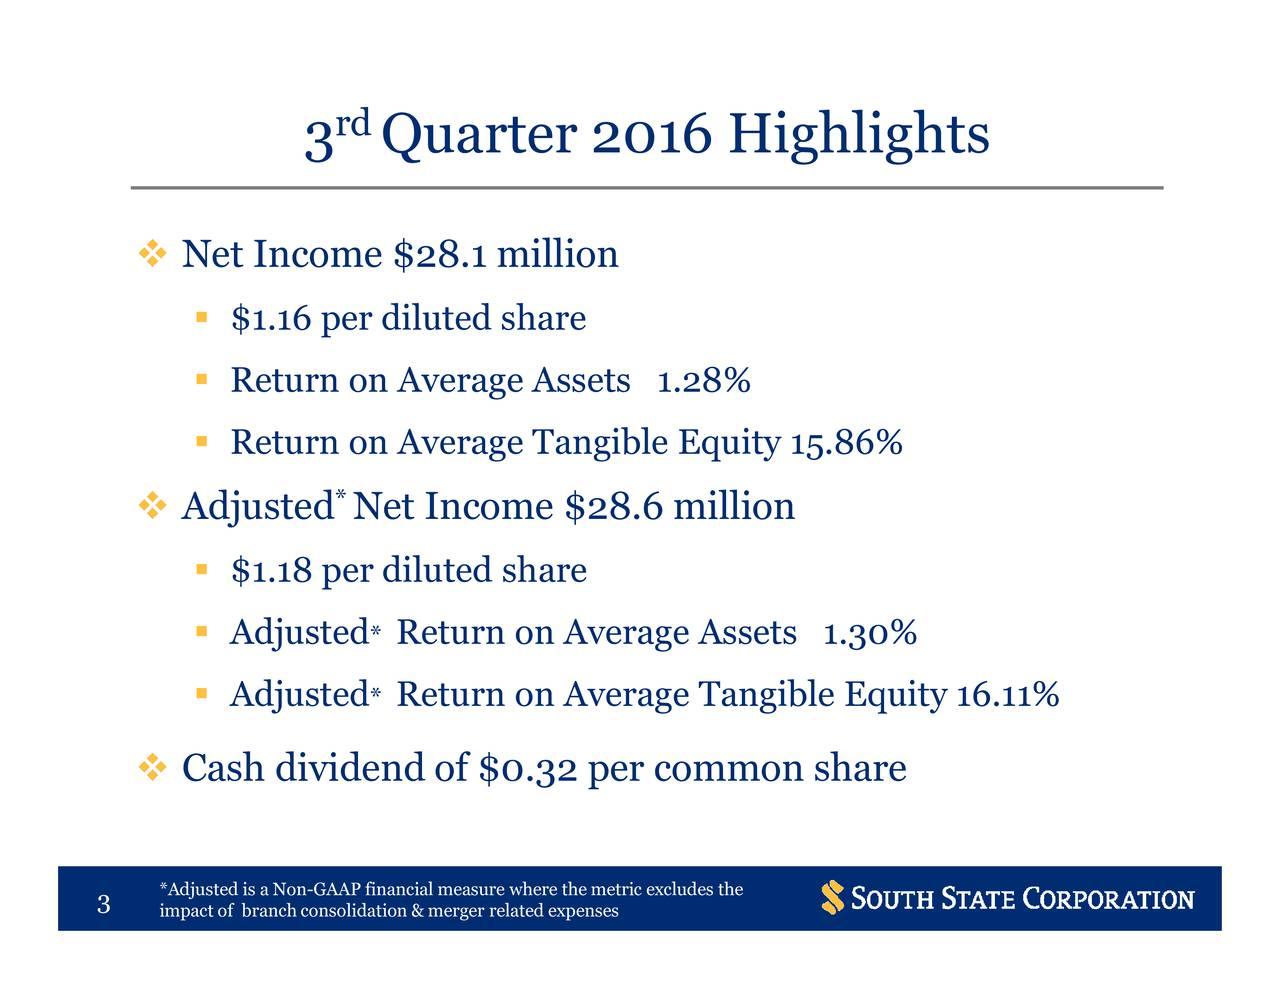 RetuRrntonnAoveAageragssTtan1.b0 Quarter 2016 Highlights Net Income $28.6 million rd * 3 $1.1RepurrdilnnAvn11vrprasdetanedish%Erquity 15.86% Net Income $28.1 million  Cash dividend of $0.32 per common share *ijtcifrncGosodaiin 3 3